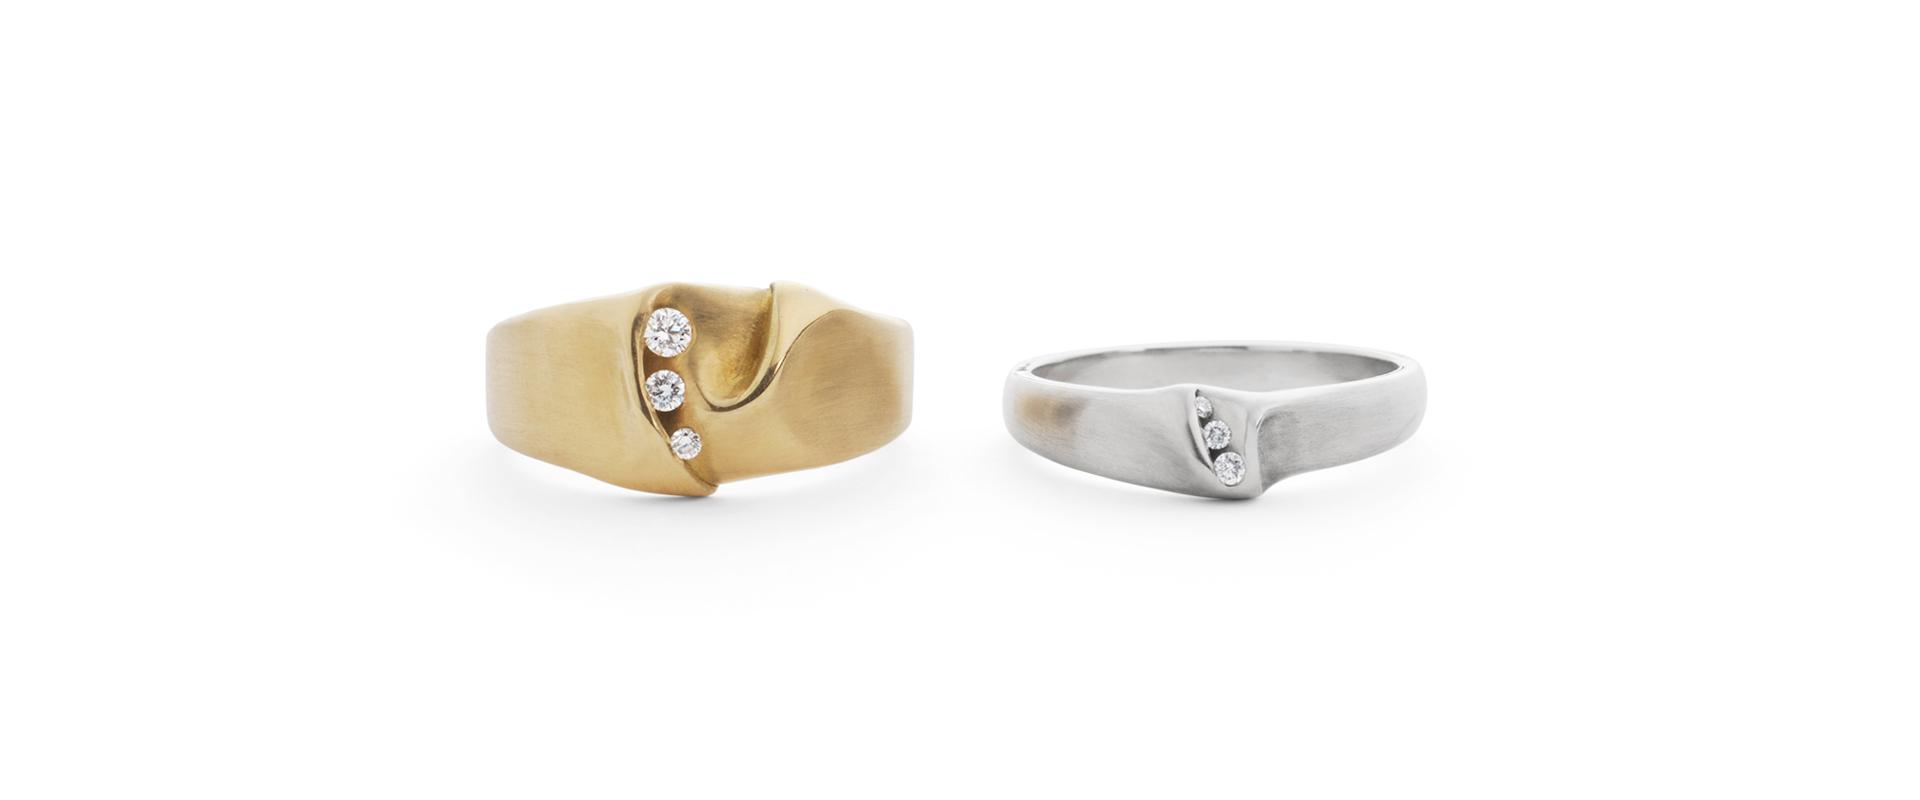 Ripple Gold Platinum Diamonds Ring Anniversary Wedding Bands